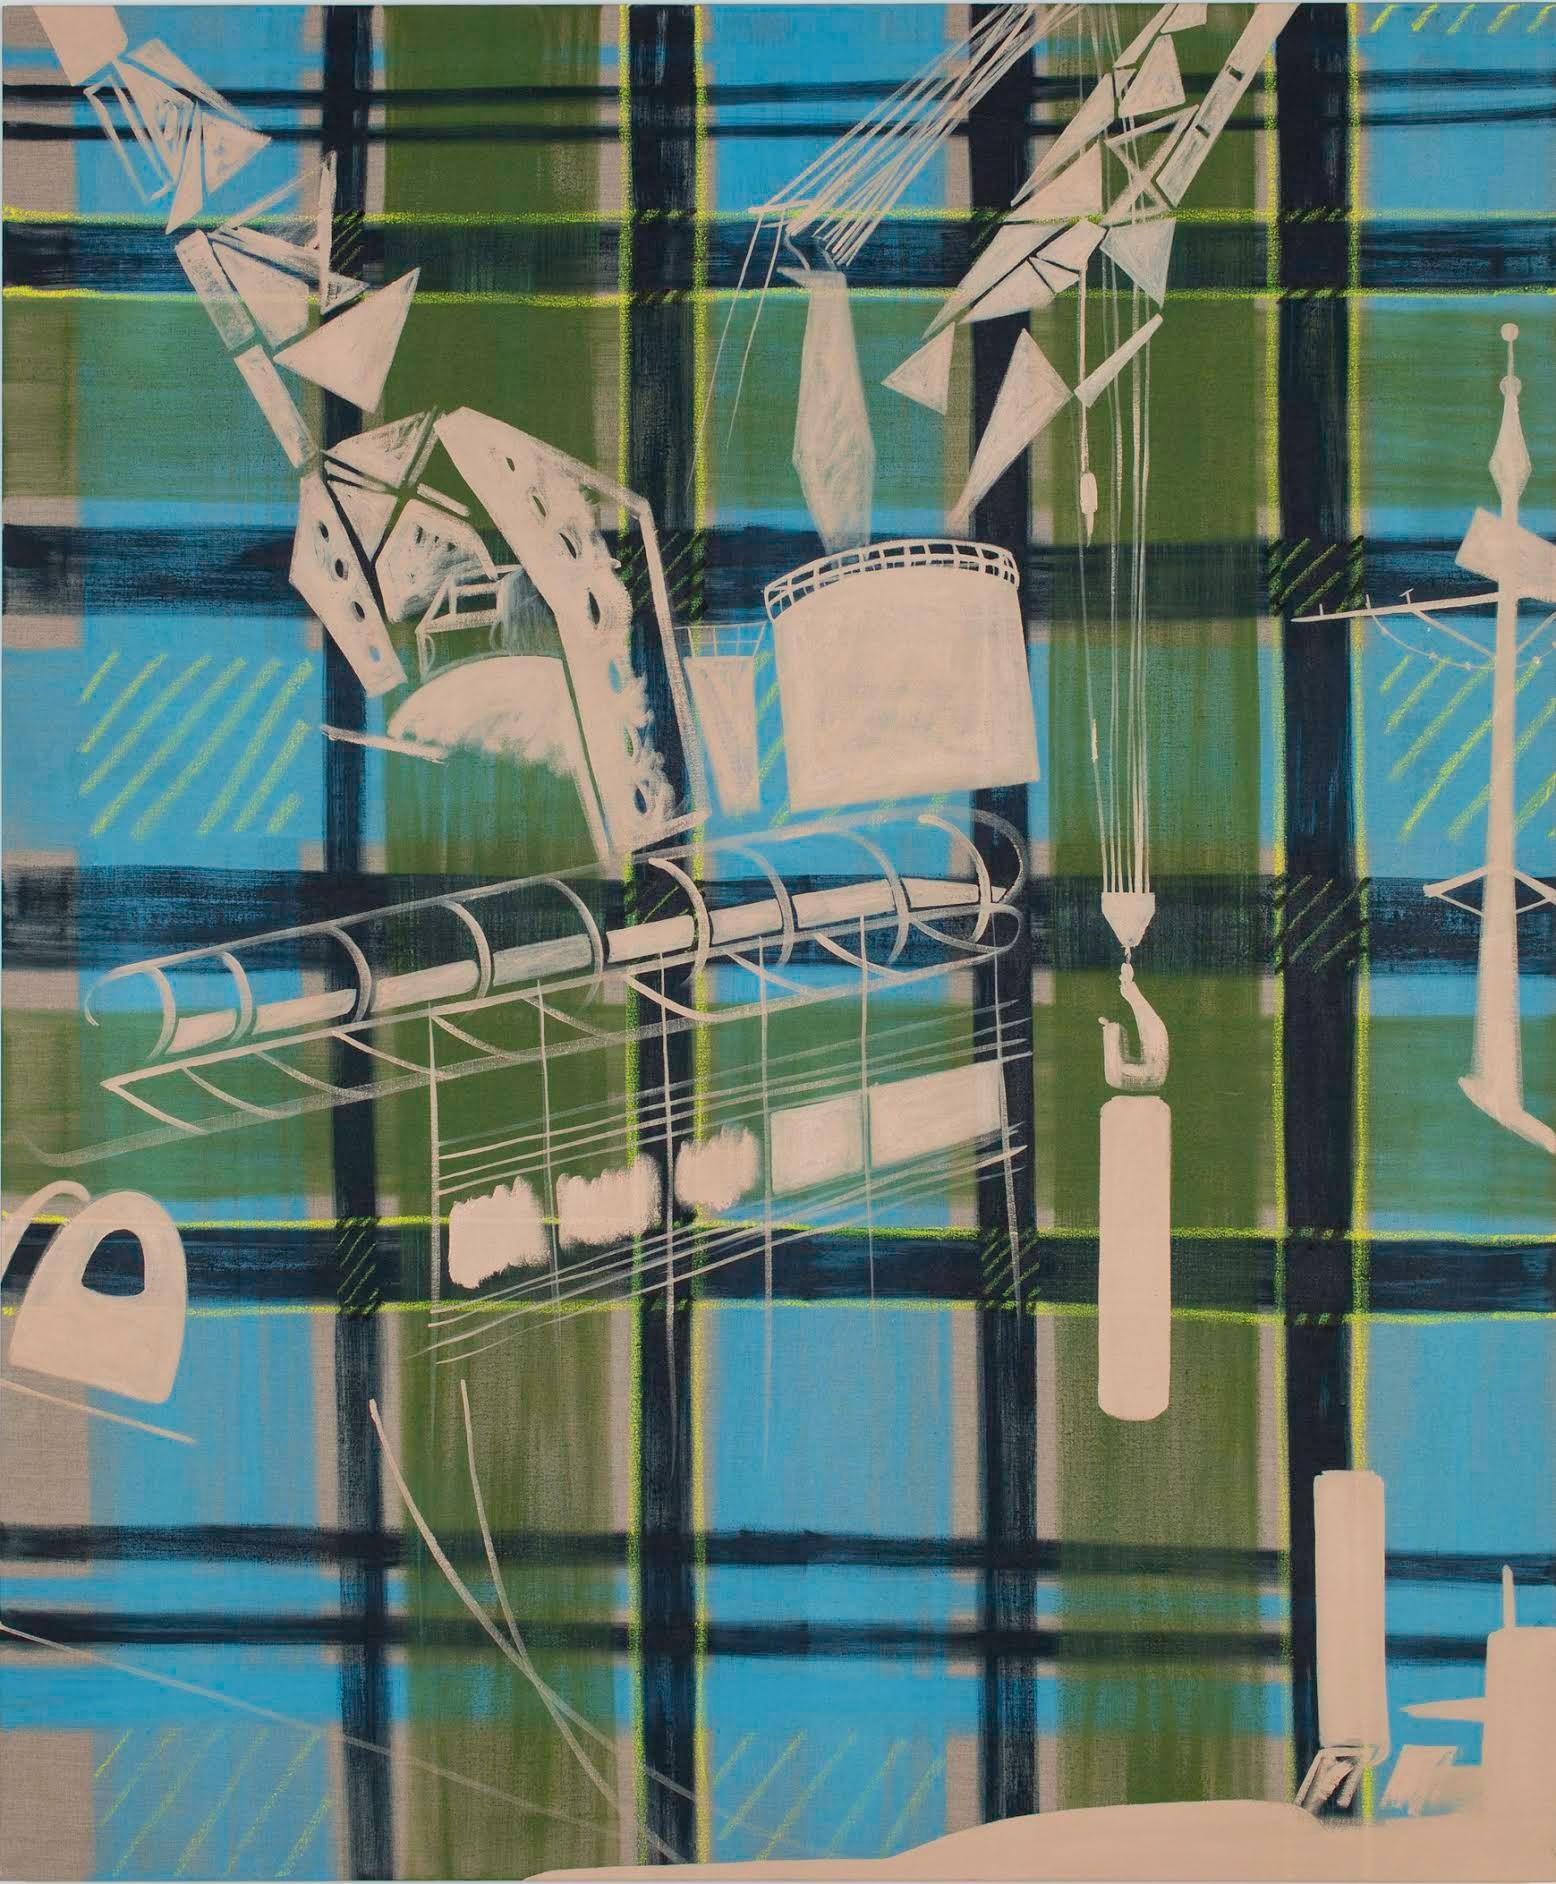 Caragh Thuriung, Polaris, 2016, oil, oil stick on linen, 65 x 54 inches (courtesy of Thomas Dane Gallery)